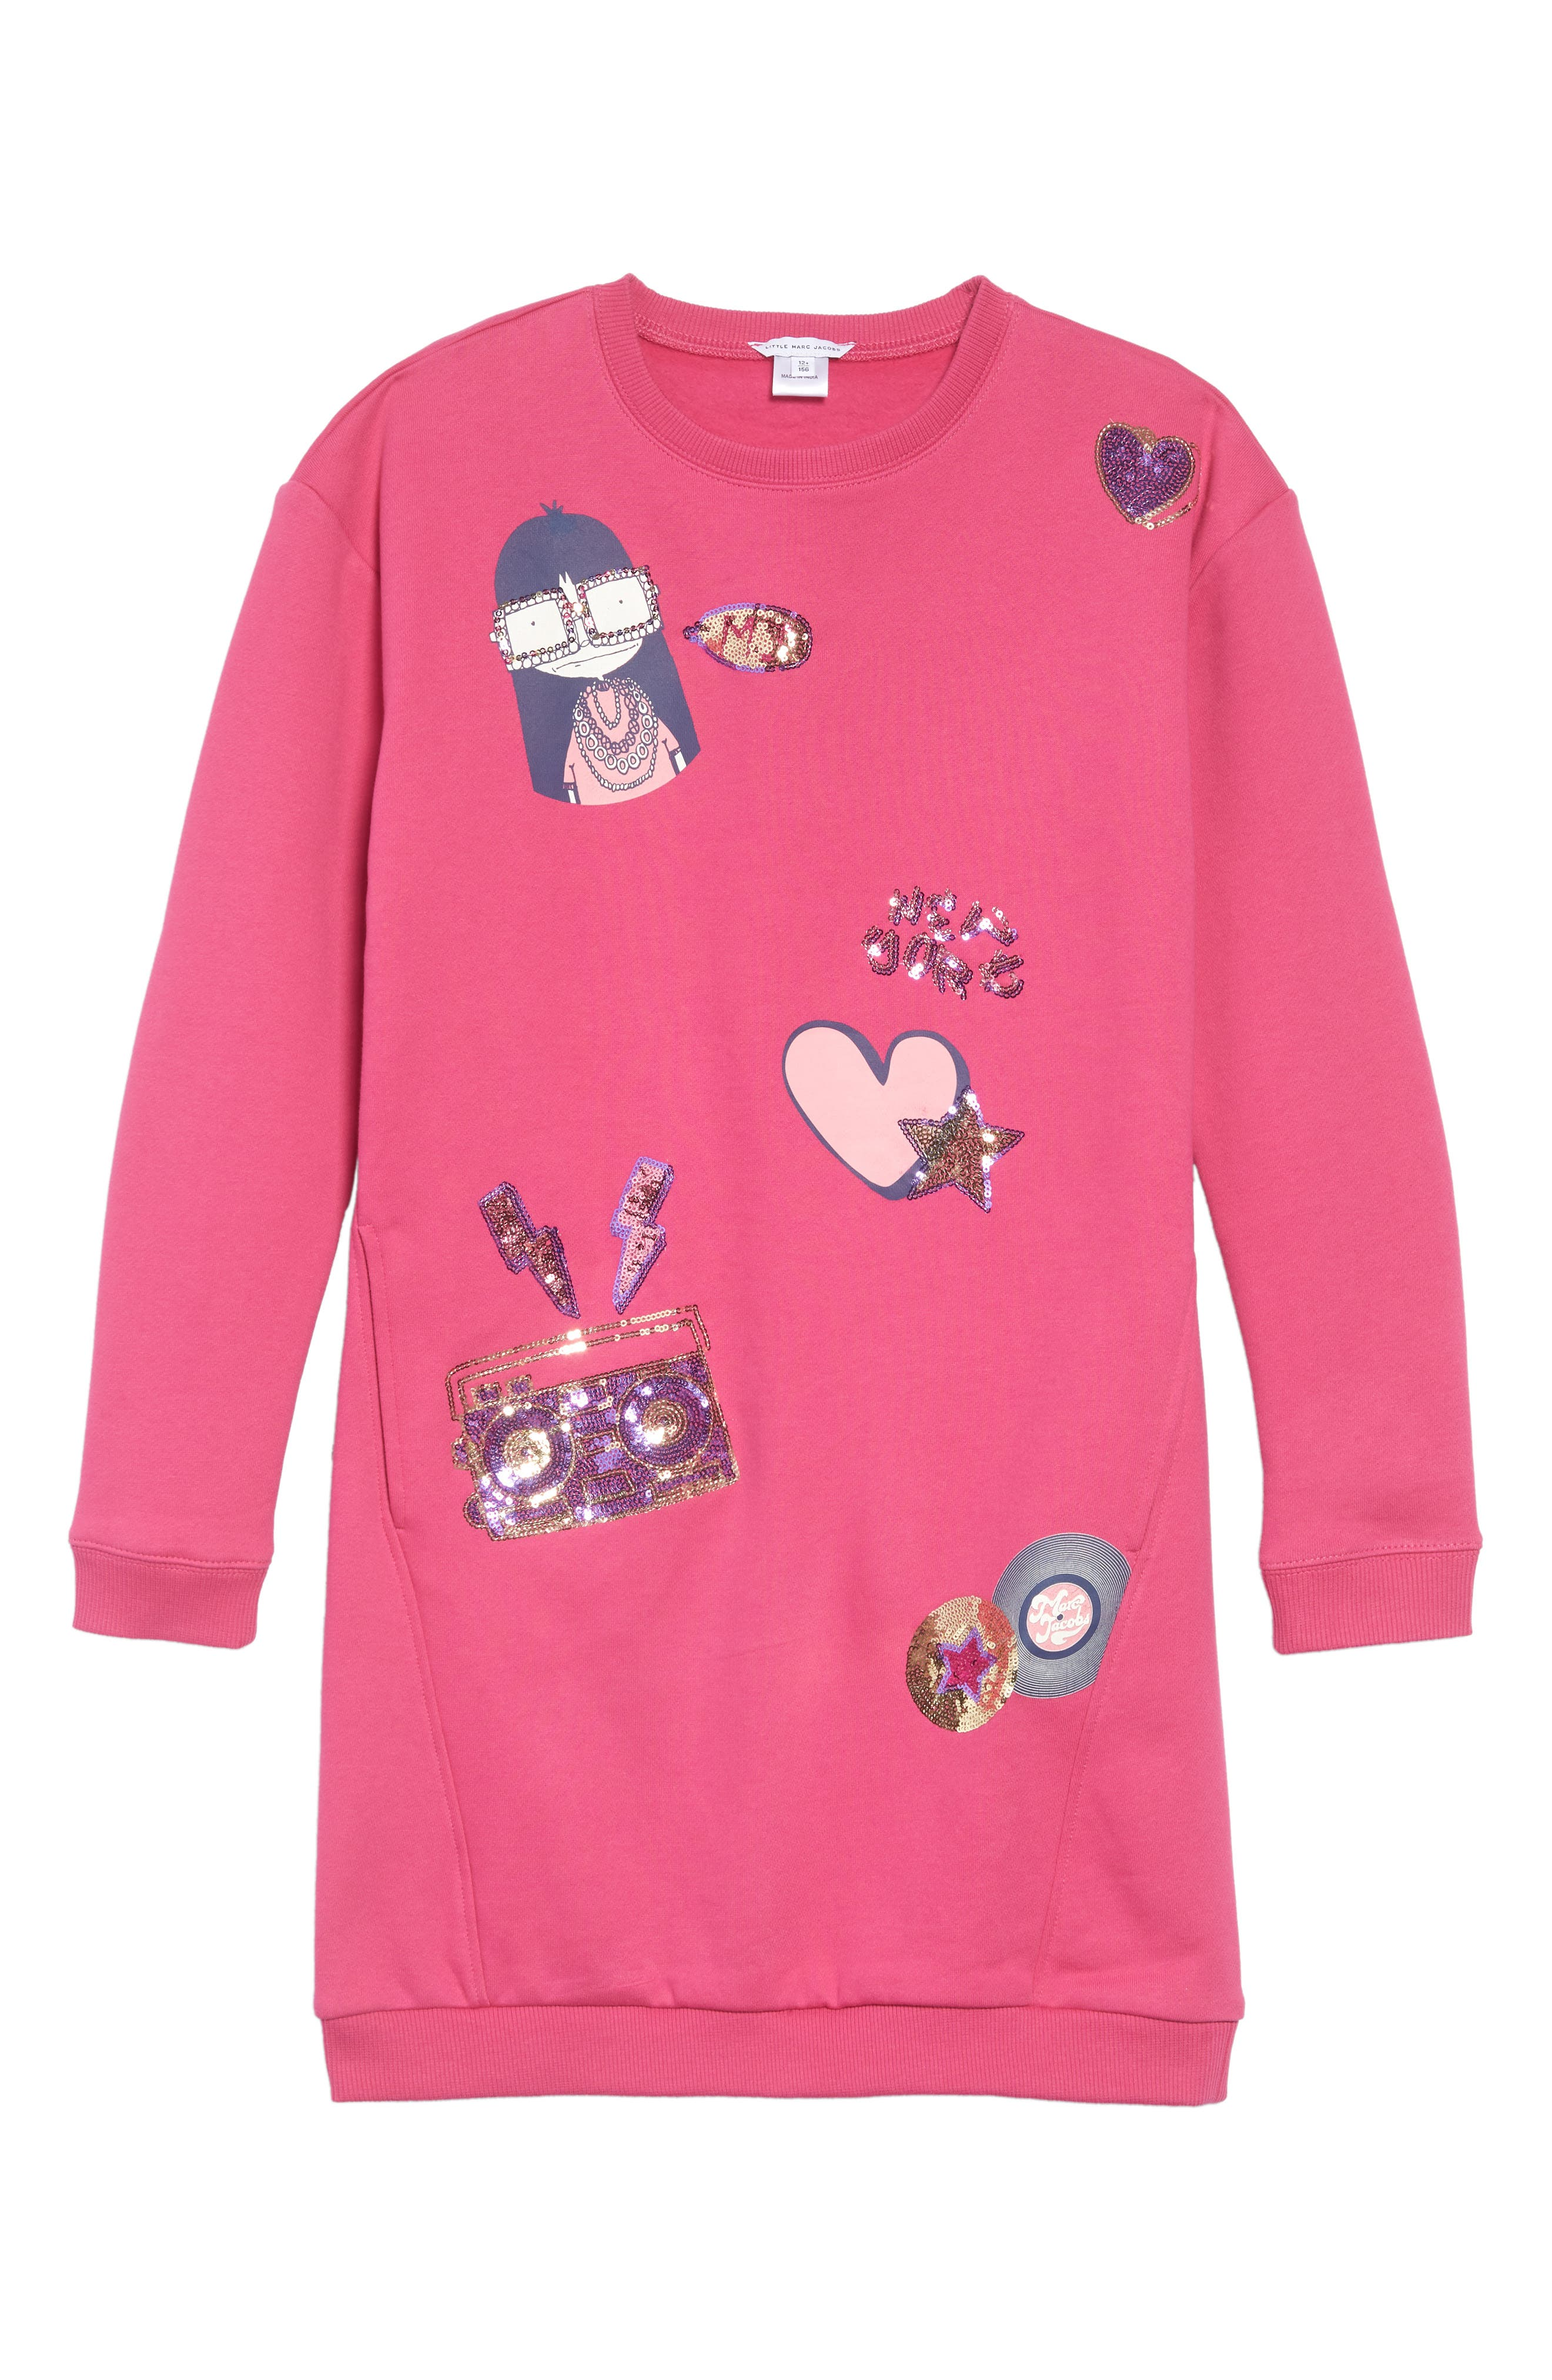 Miss Marc Sweatshirt Dress,                             Main thumbnail 1, color,                             670